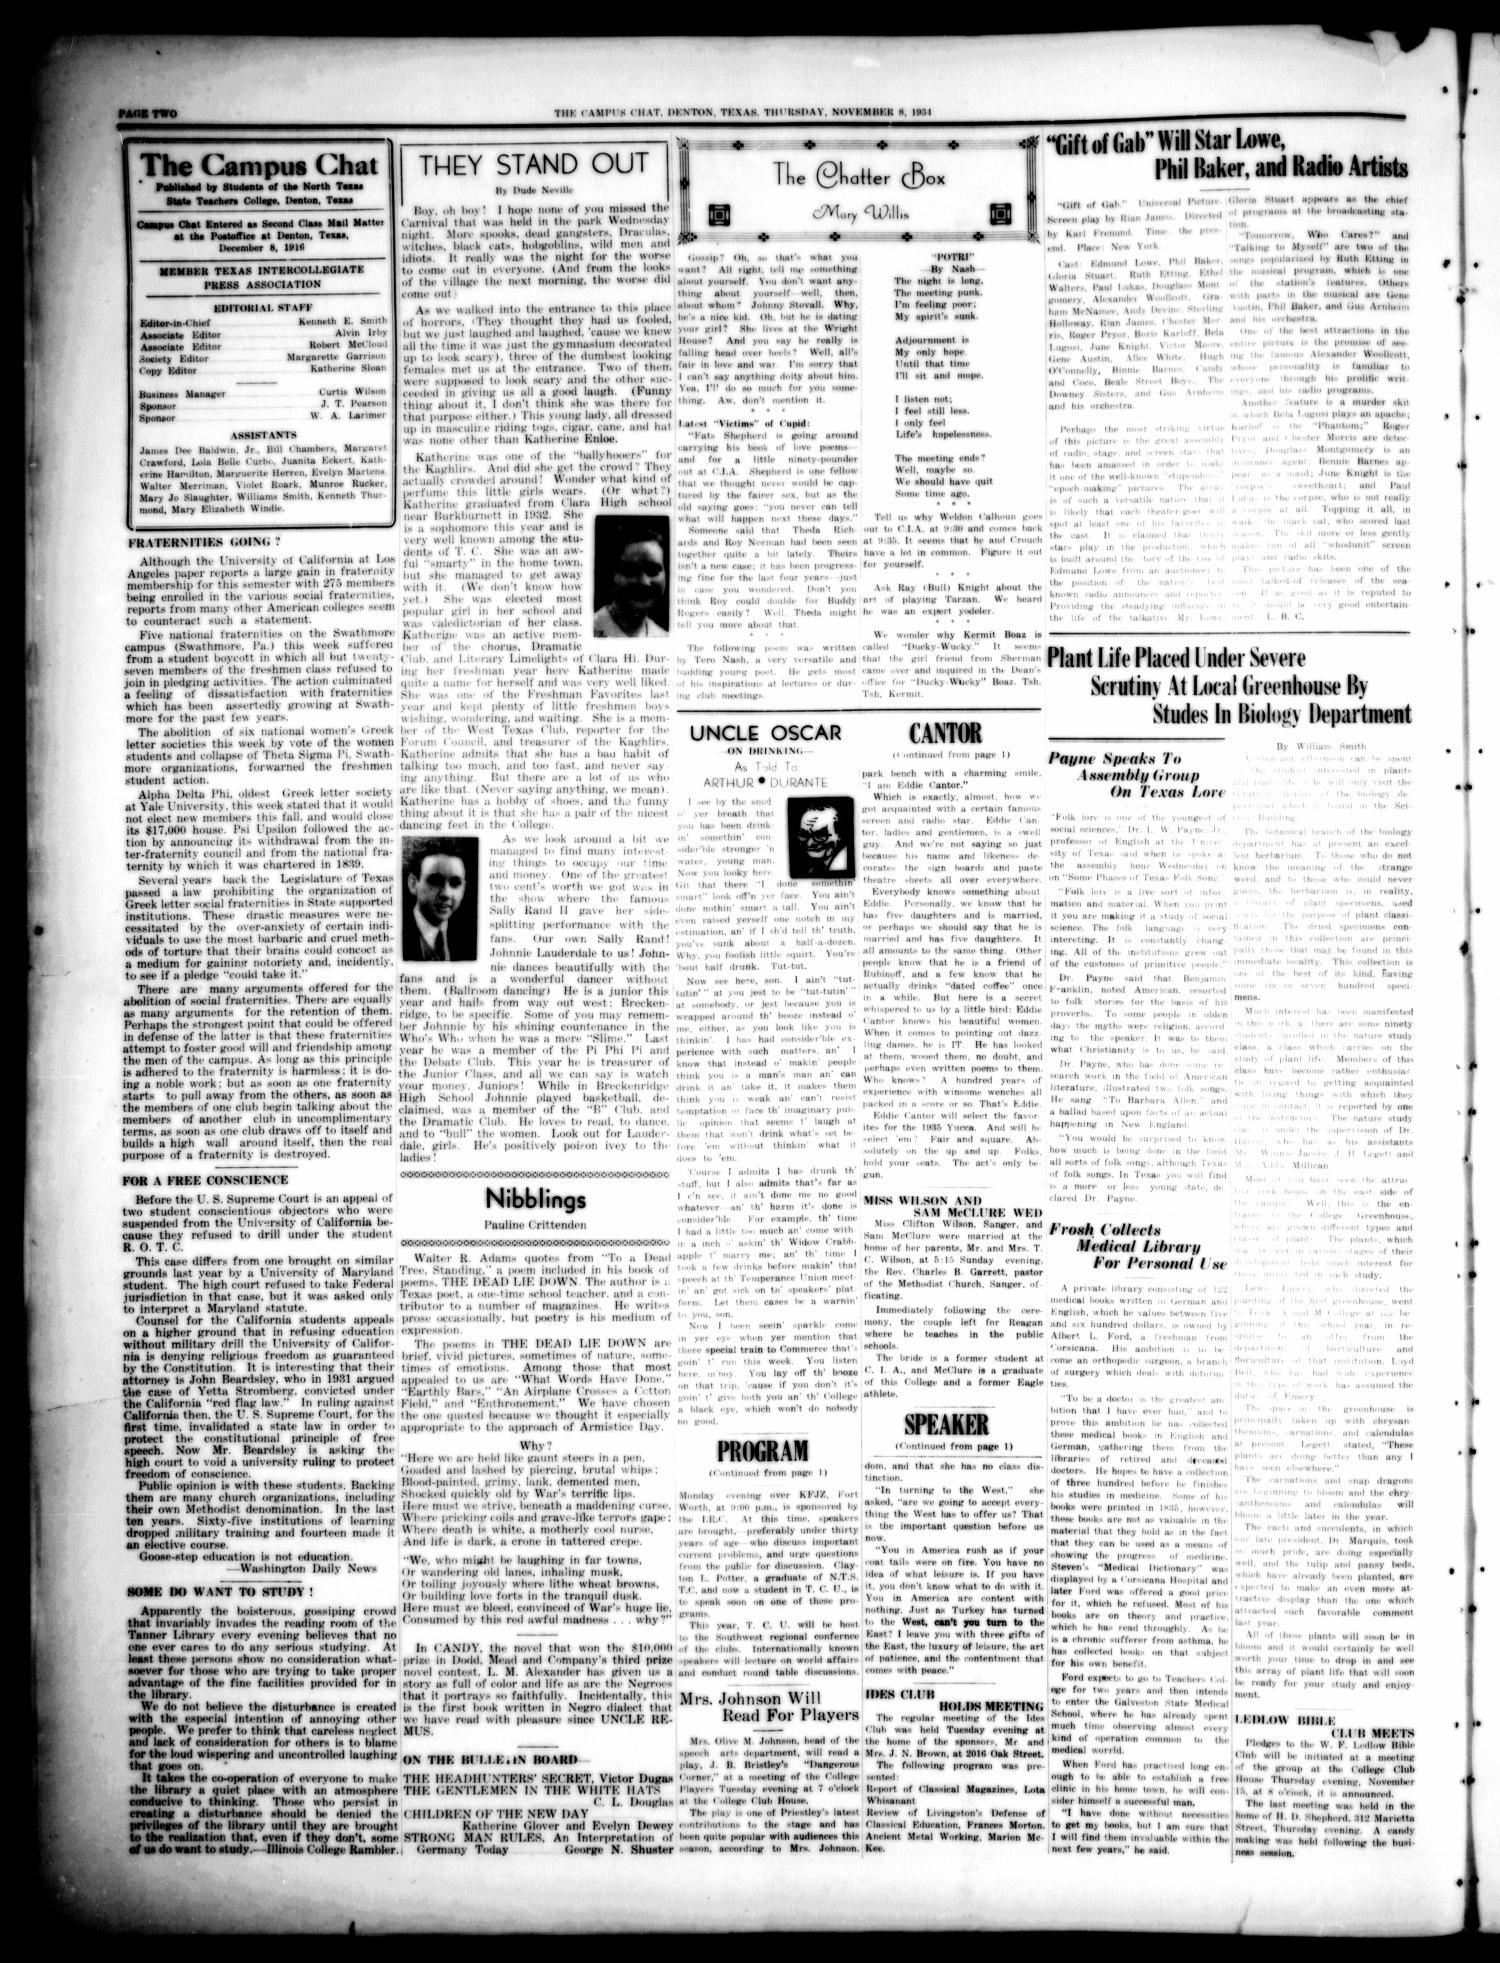 the c us chat denton tex vol 19 no 7 ed 1 thursday Gift of Gab Idiom the c us chat denton tex vol 19 no 7 ed 1 thursday november 8 1934 page 2 of 4 the portal to texas history